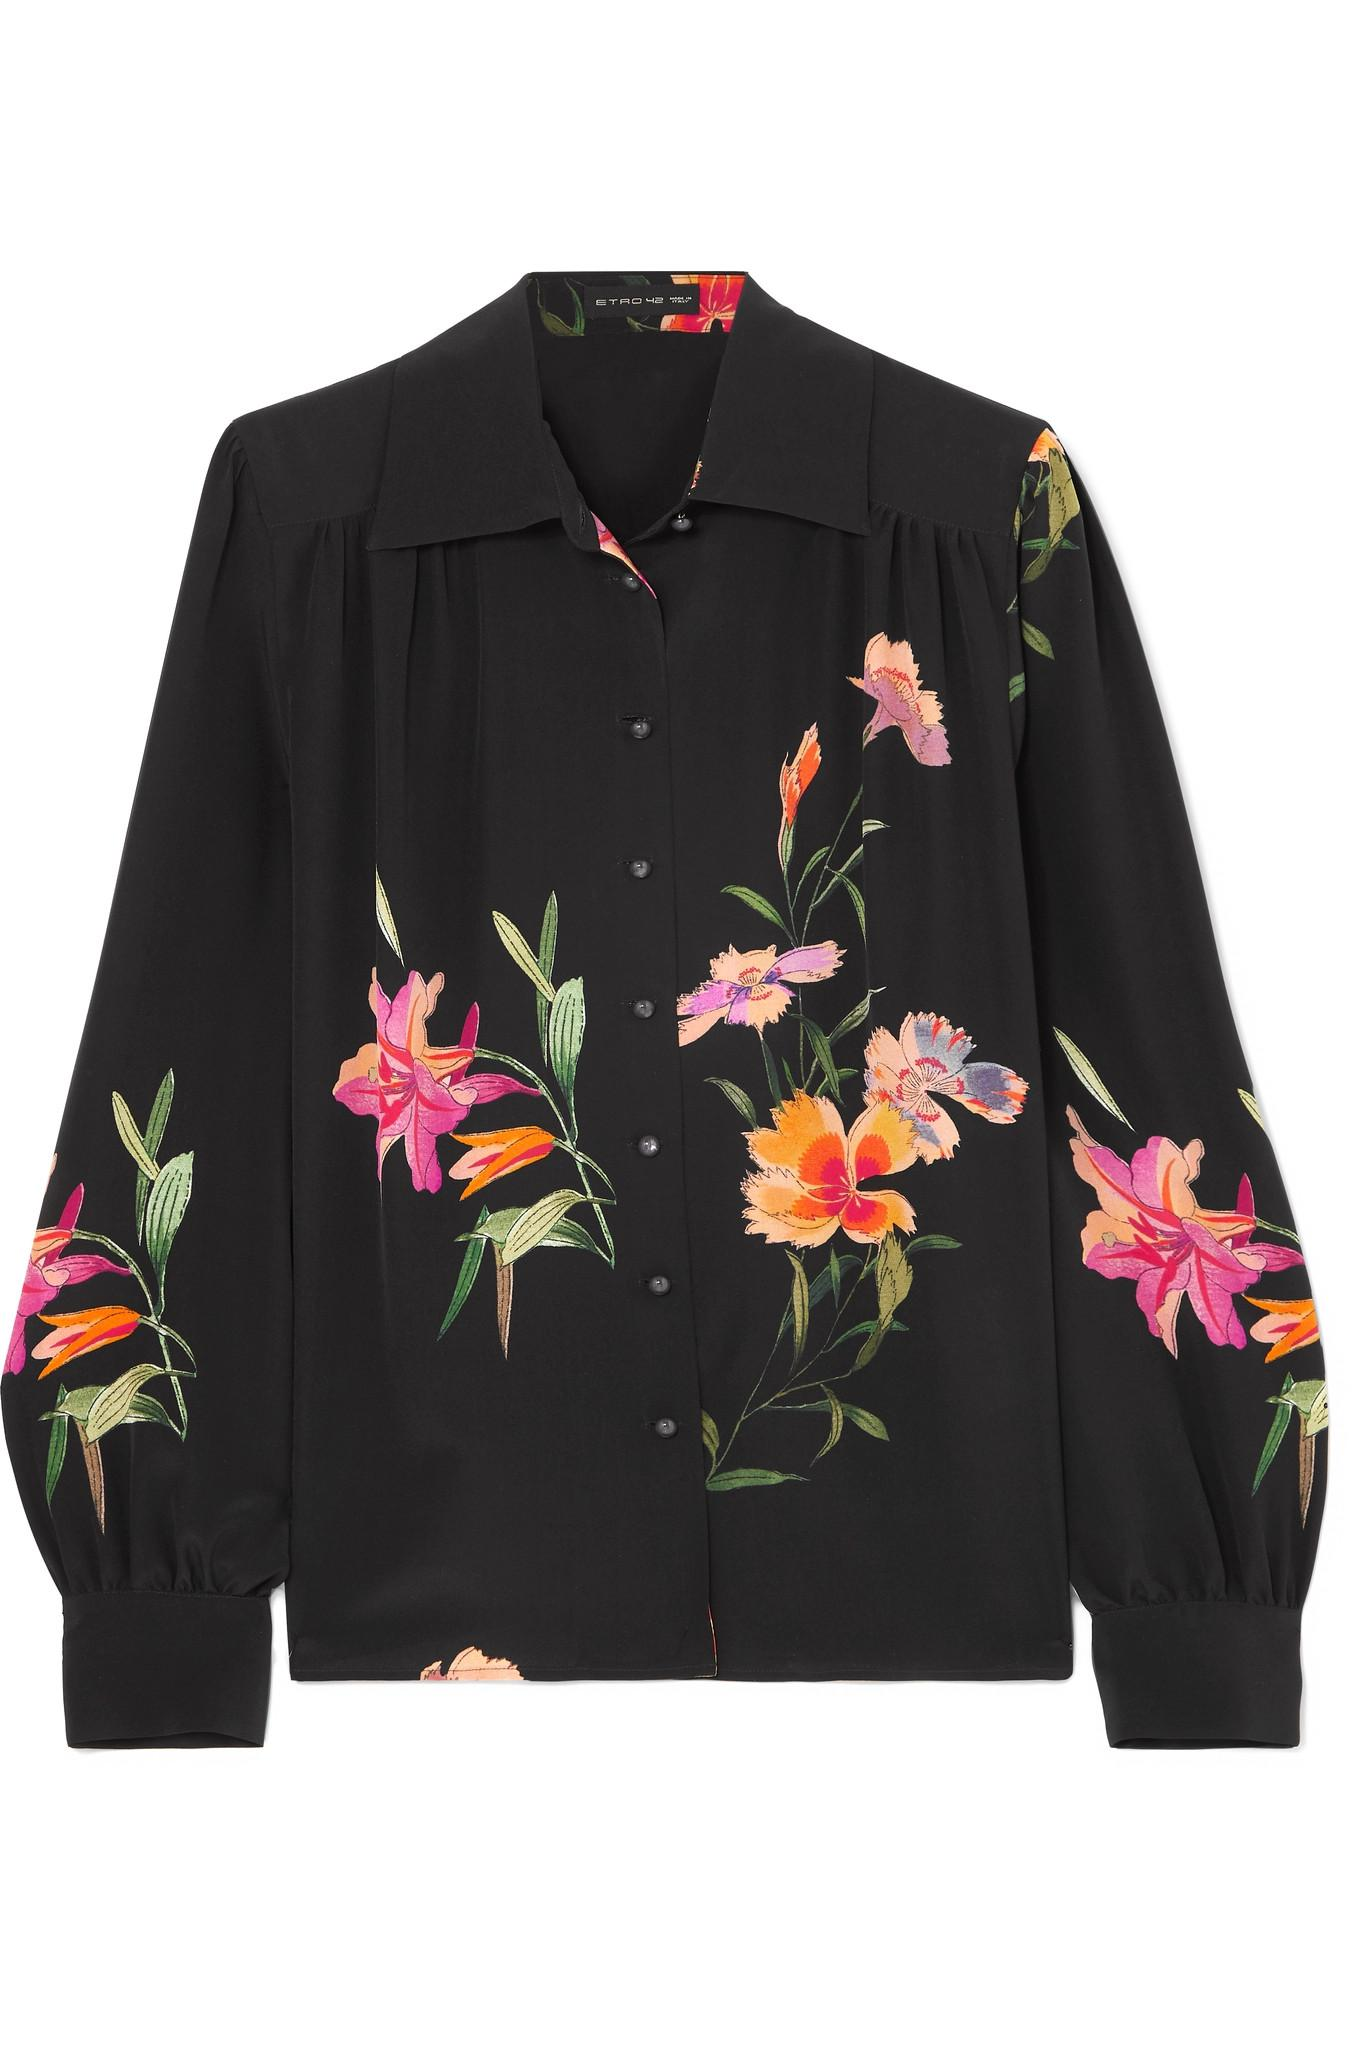 423b9558dfd6a Lyst - Etro Floral-print Silk-crepe Shirt in Black